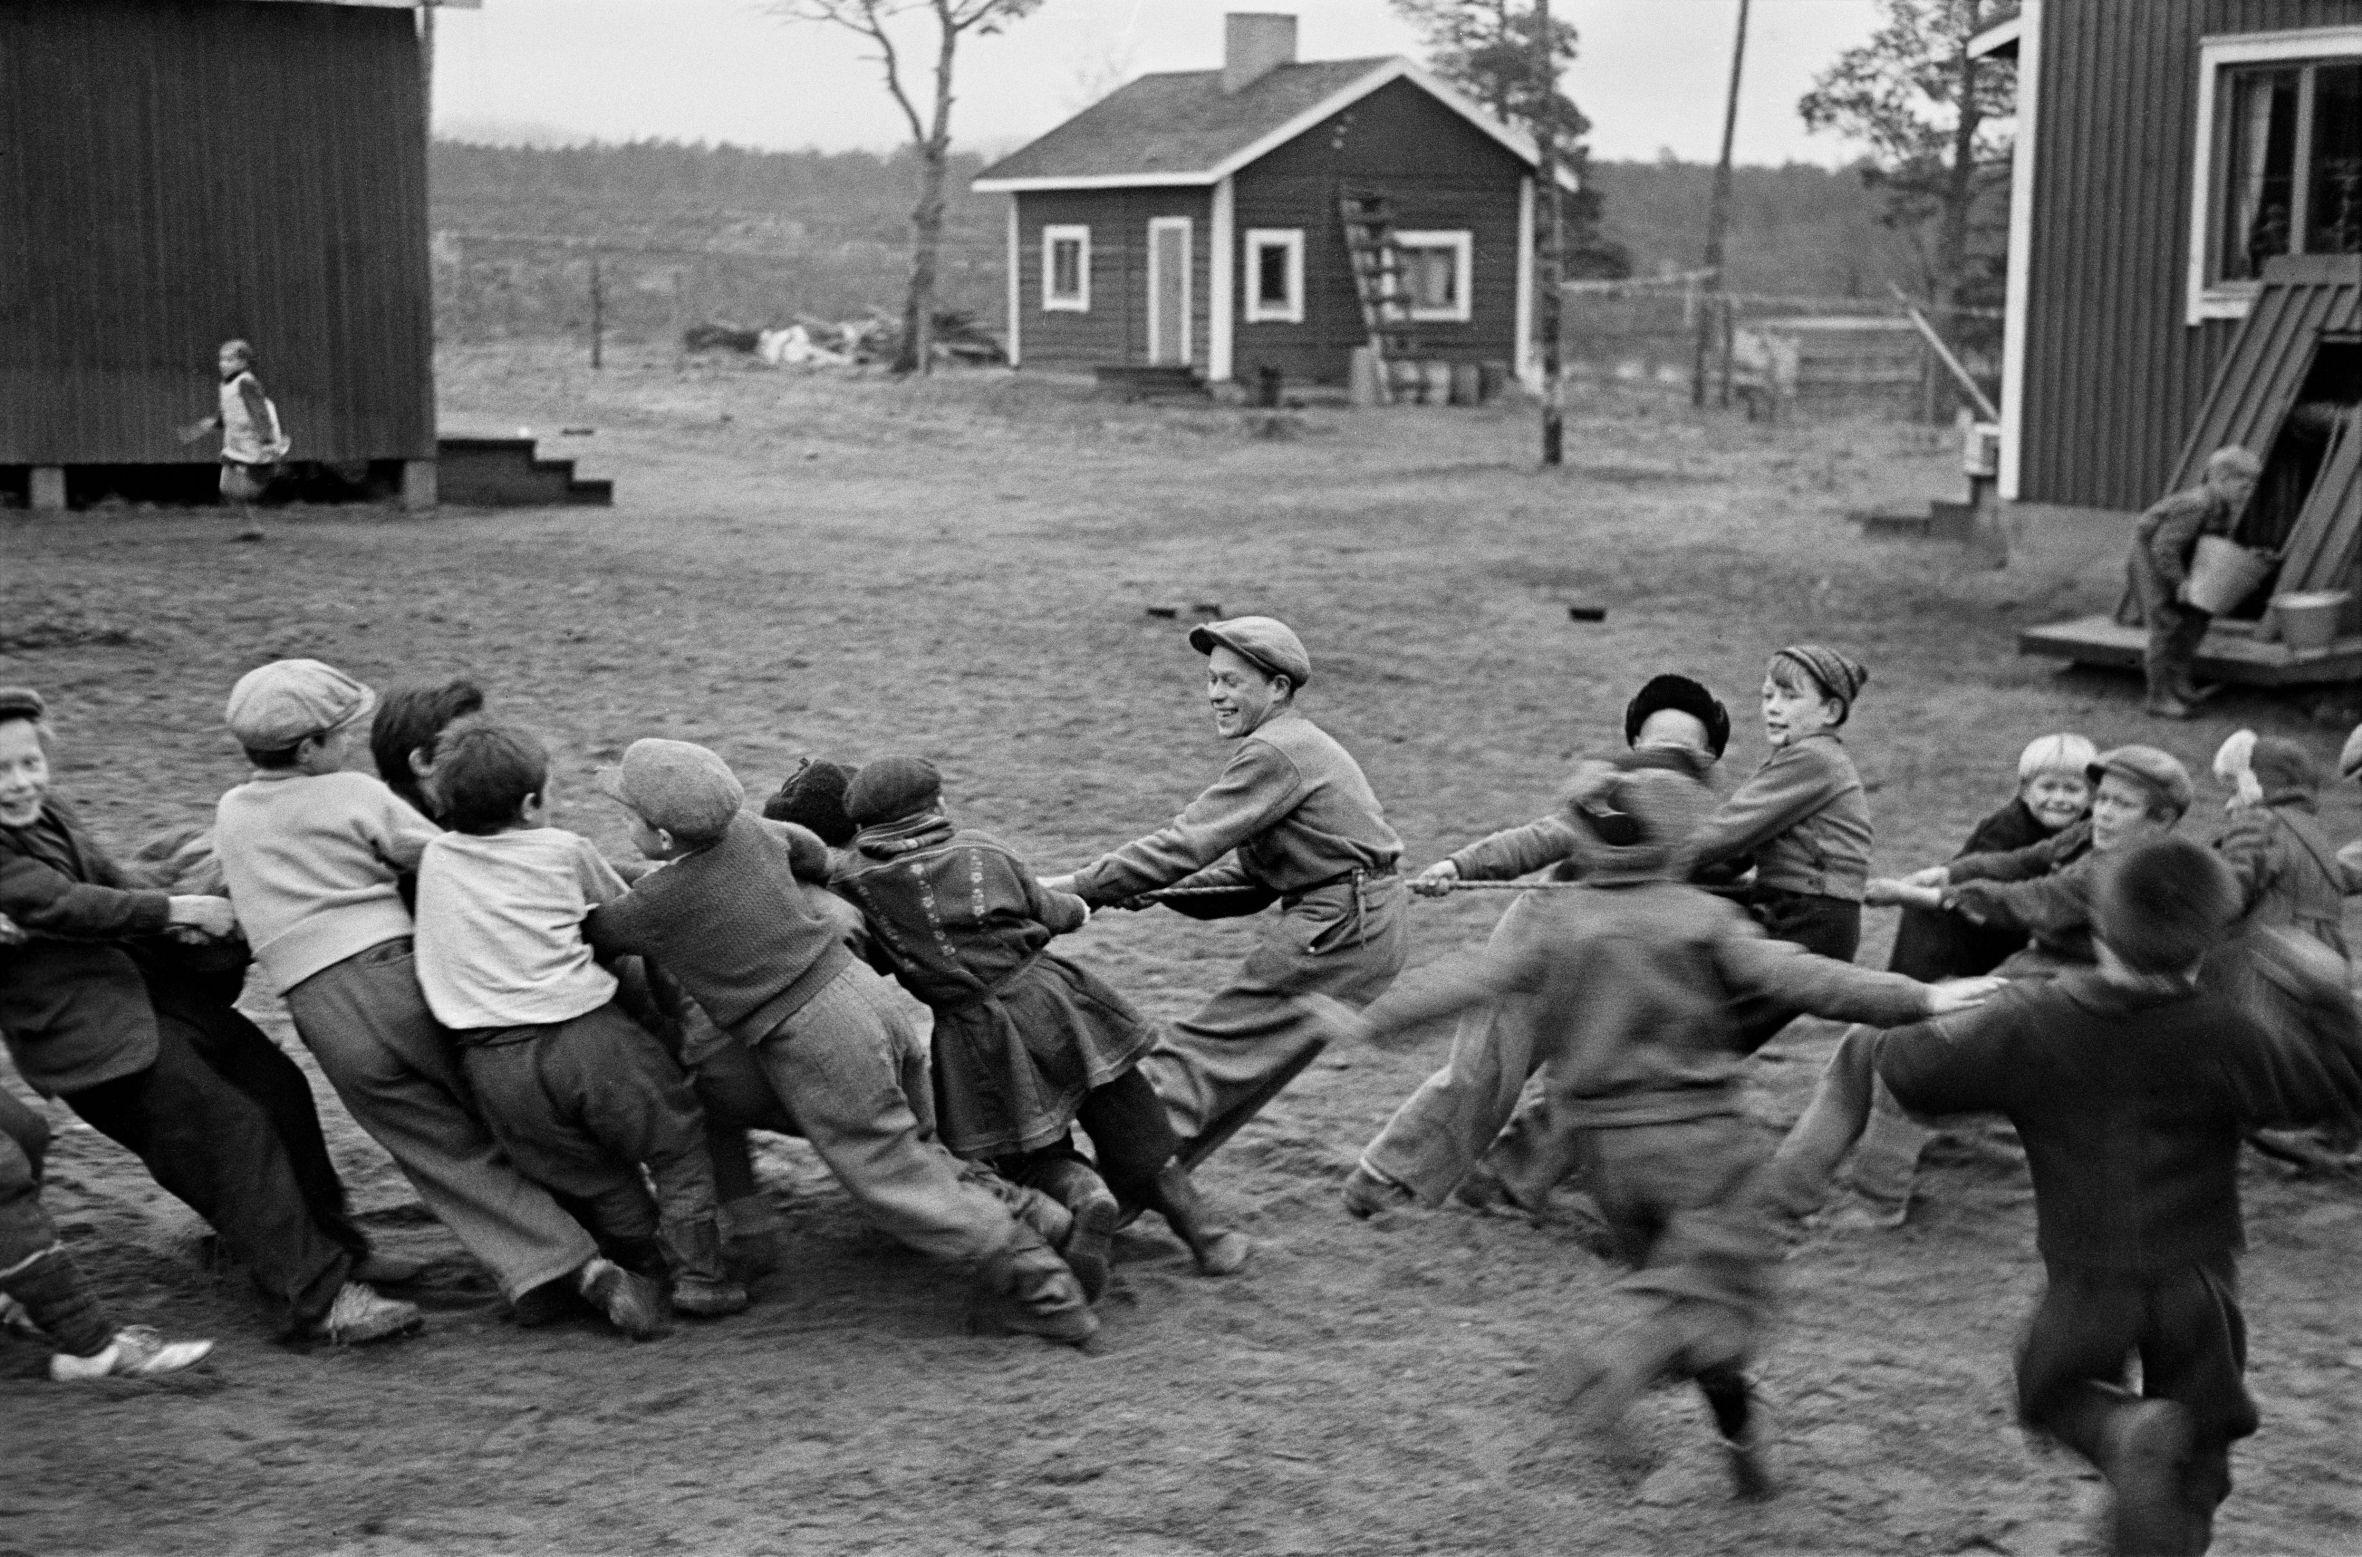 Finland. Naarva. 1948 © Werner Bischof _ Magnum Photos 2019